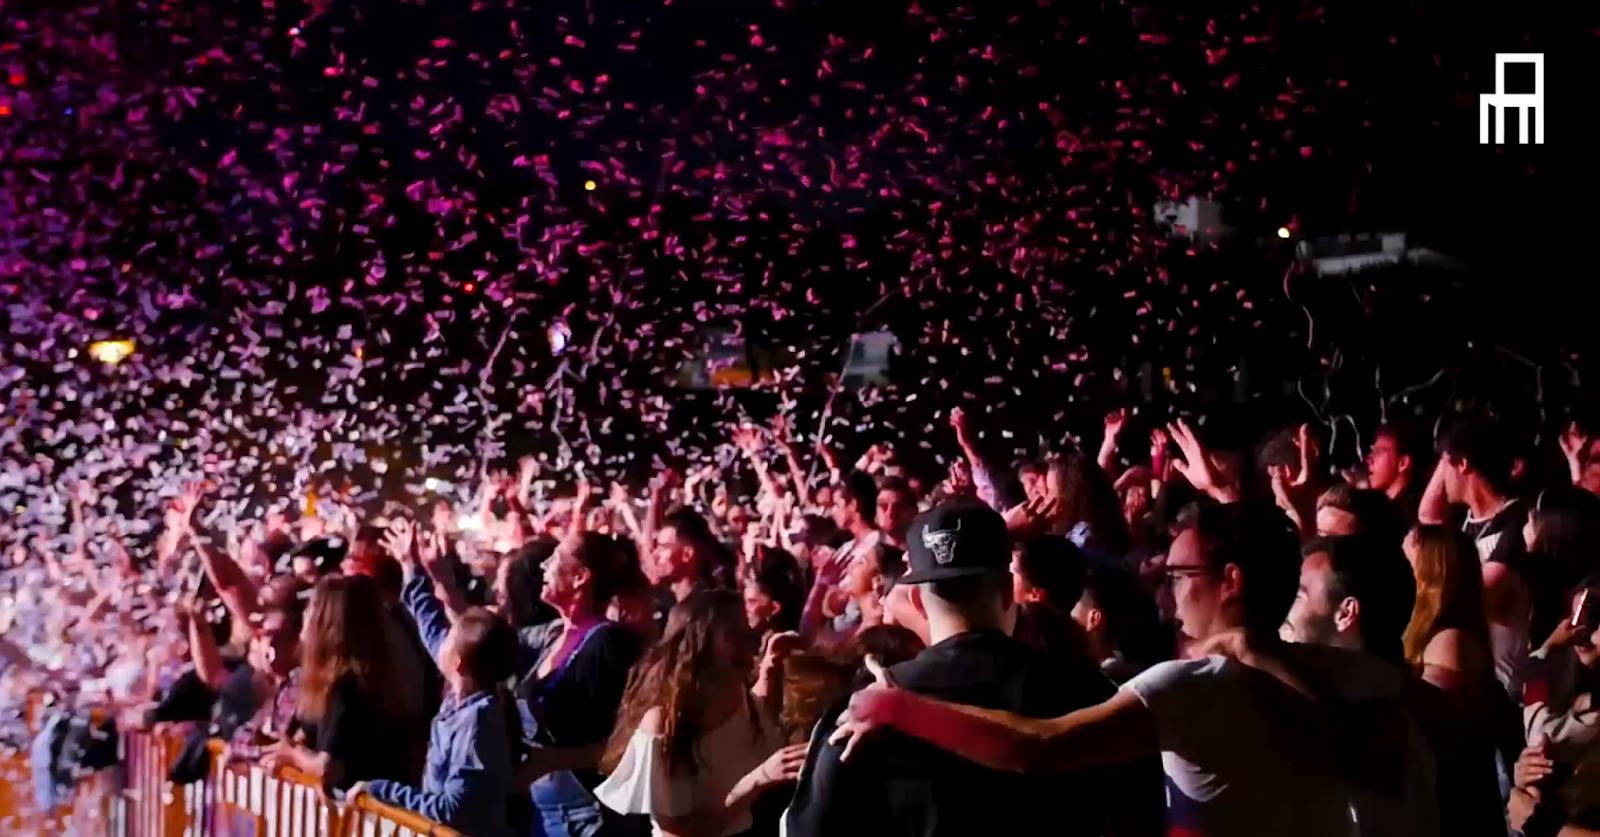 Festas da Cidade de Paredes 2020